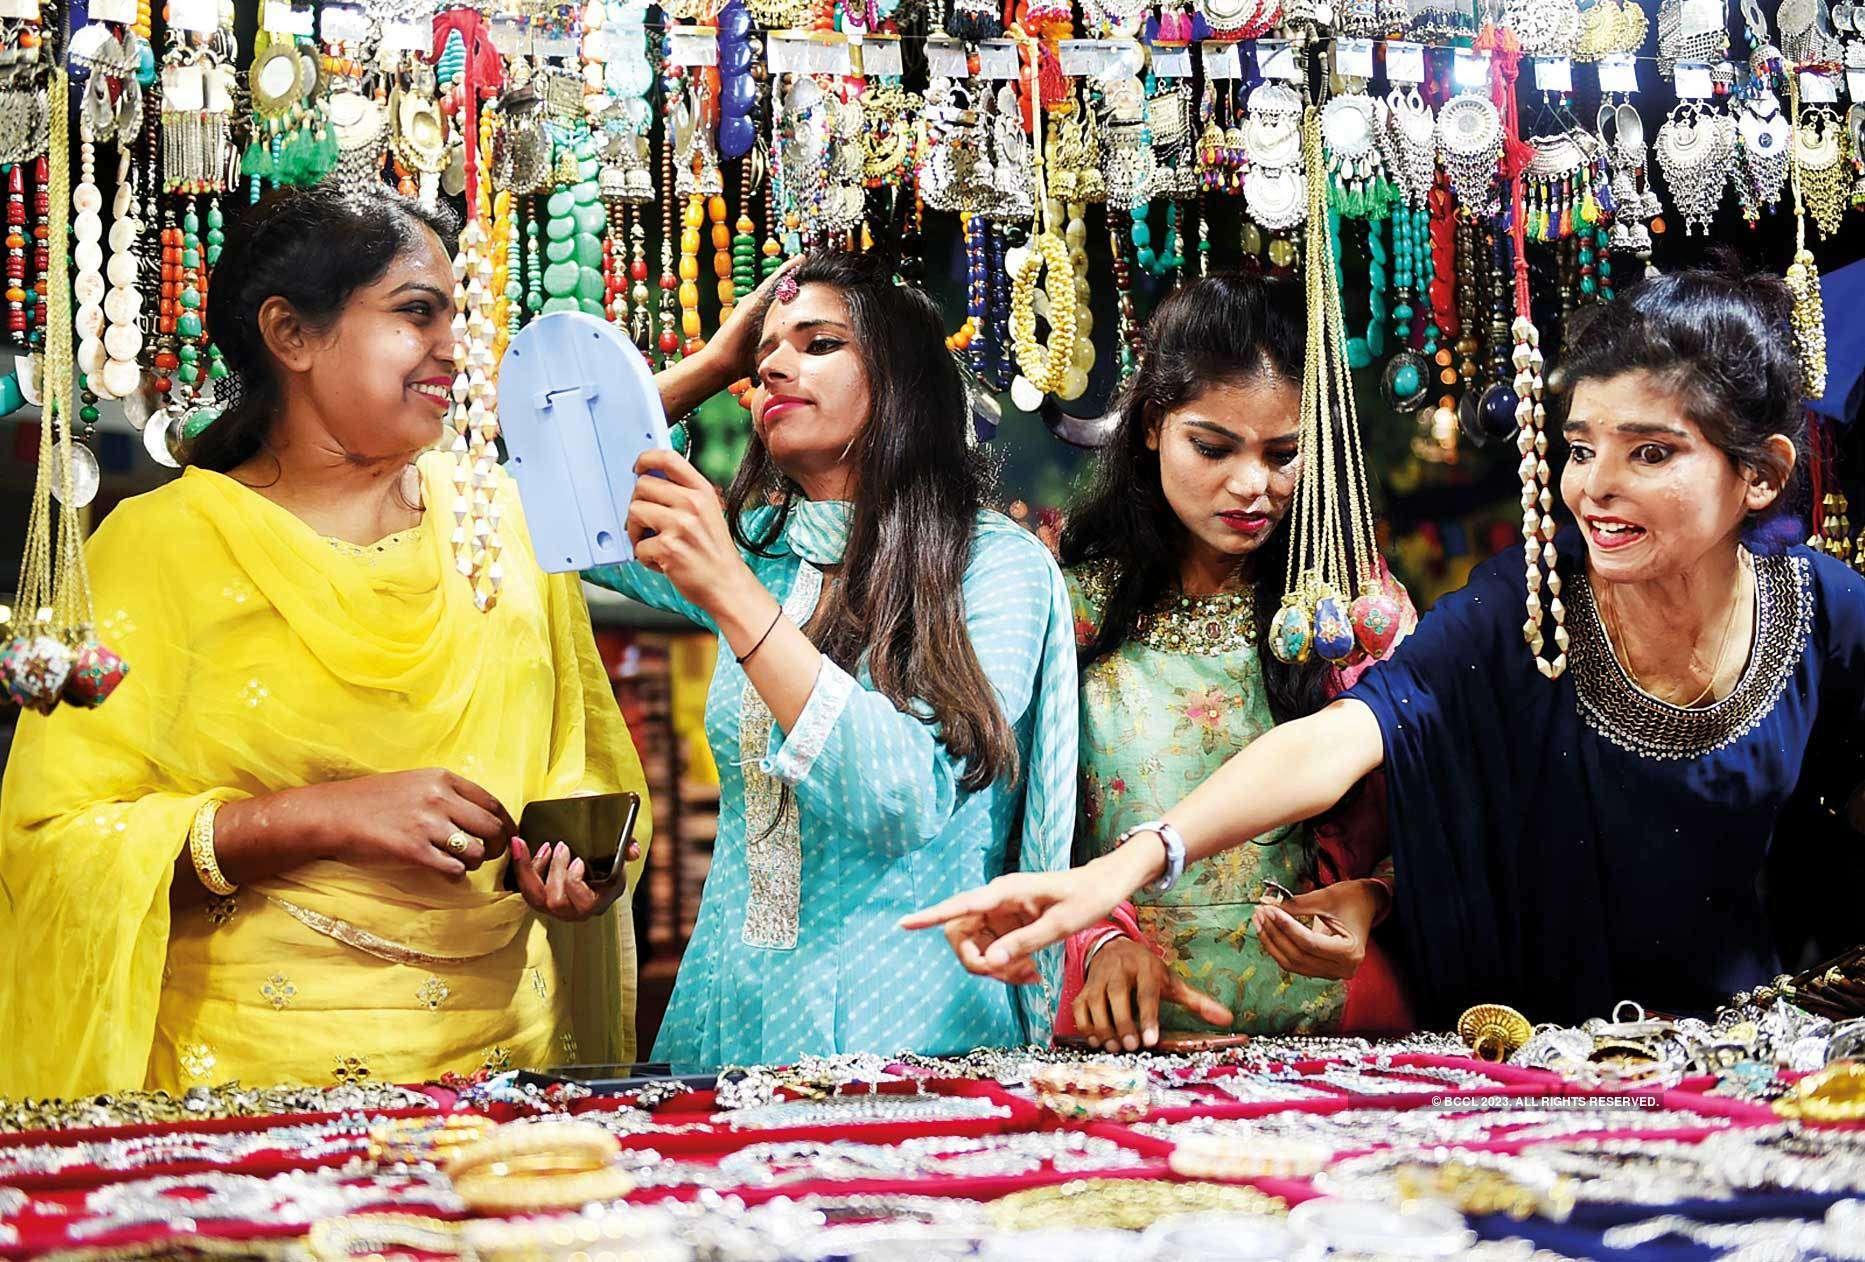 (L-R) Bala Prajapati,  Jeetu Sharma, Kunti Soni and Ritu Saini at Dilli Haat